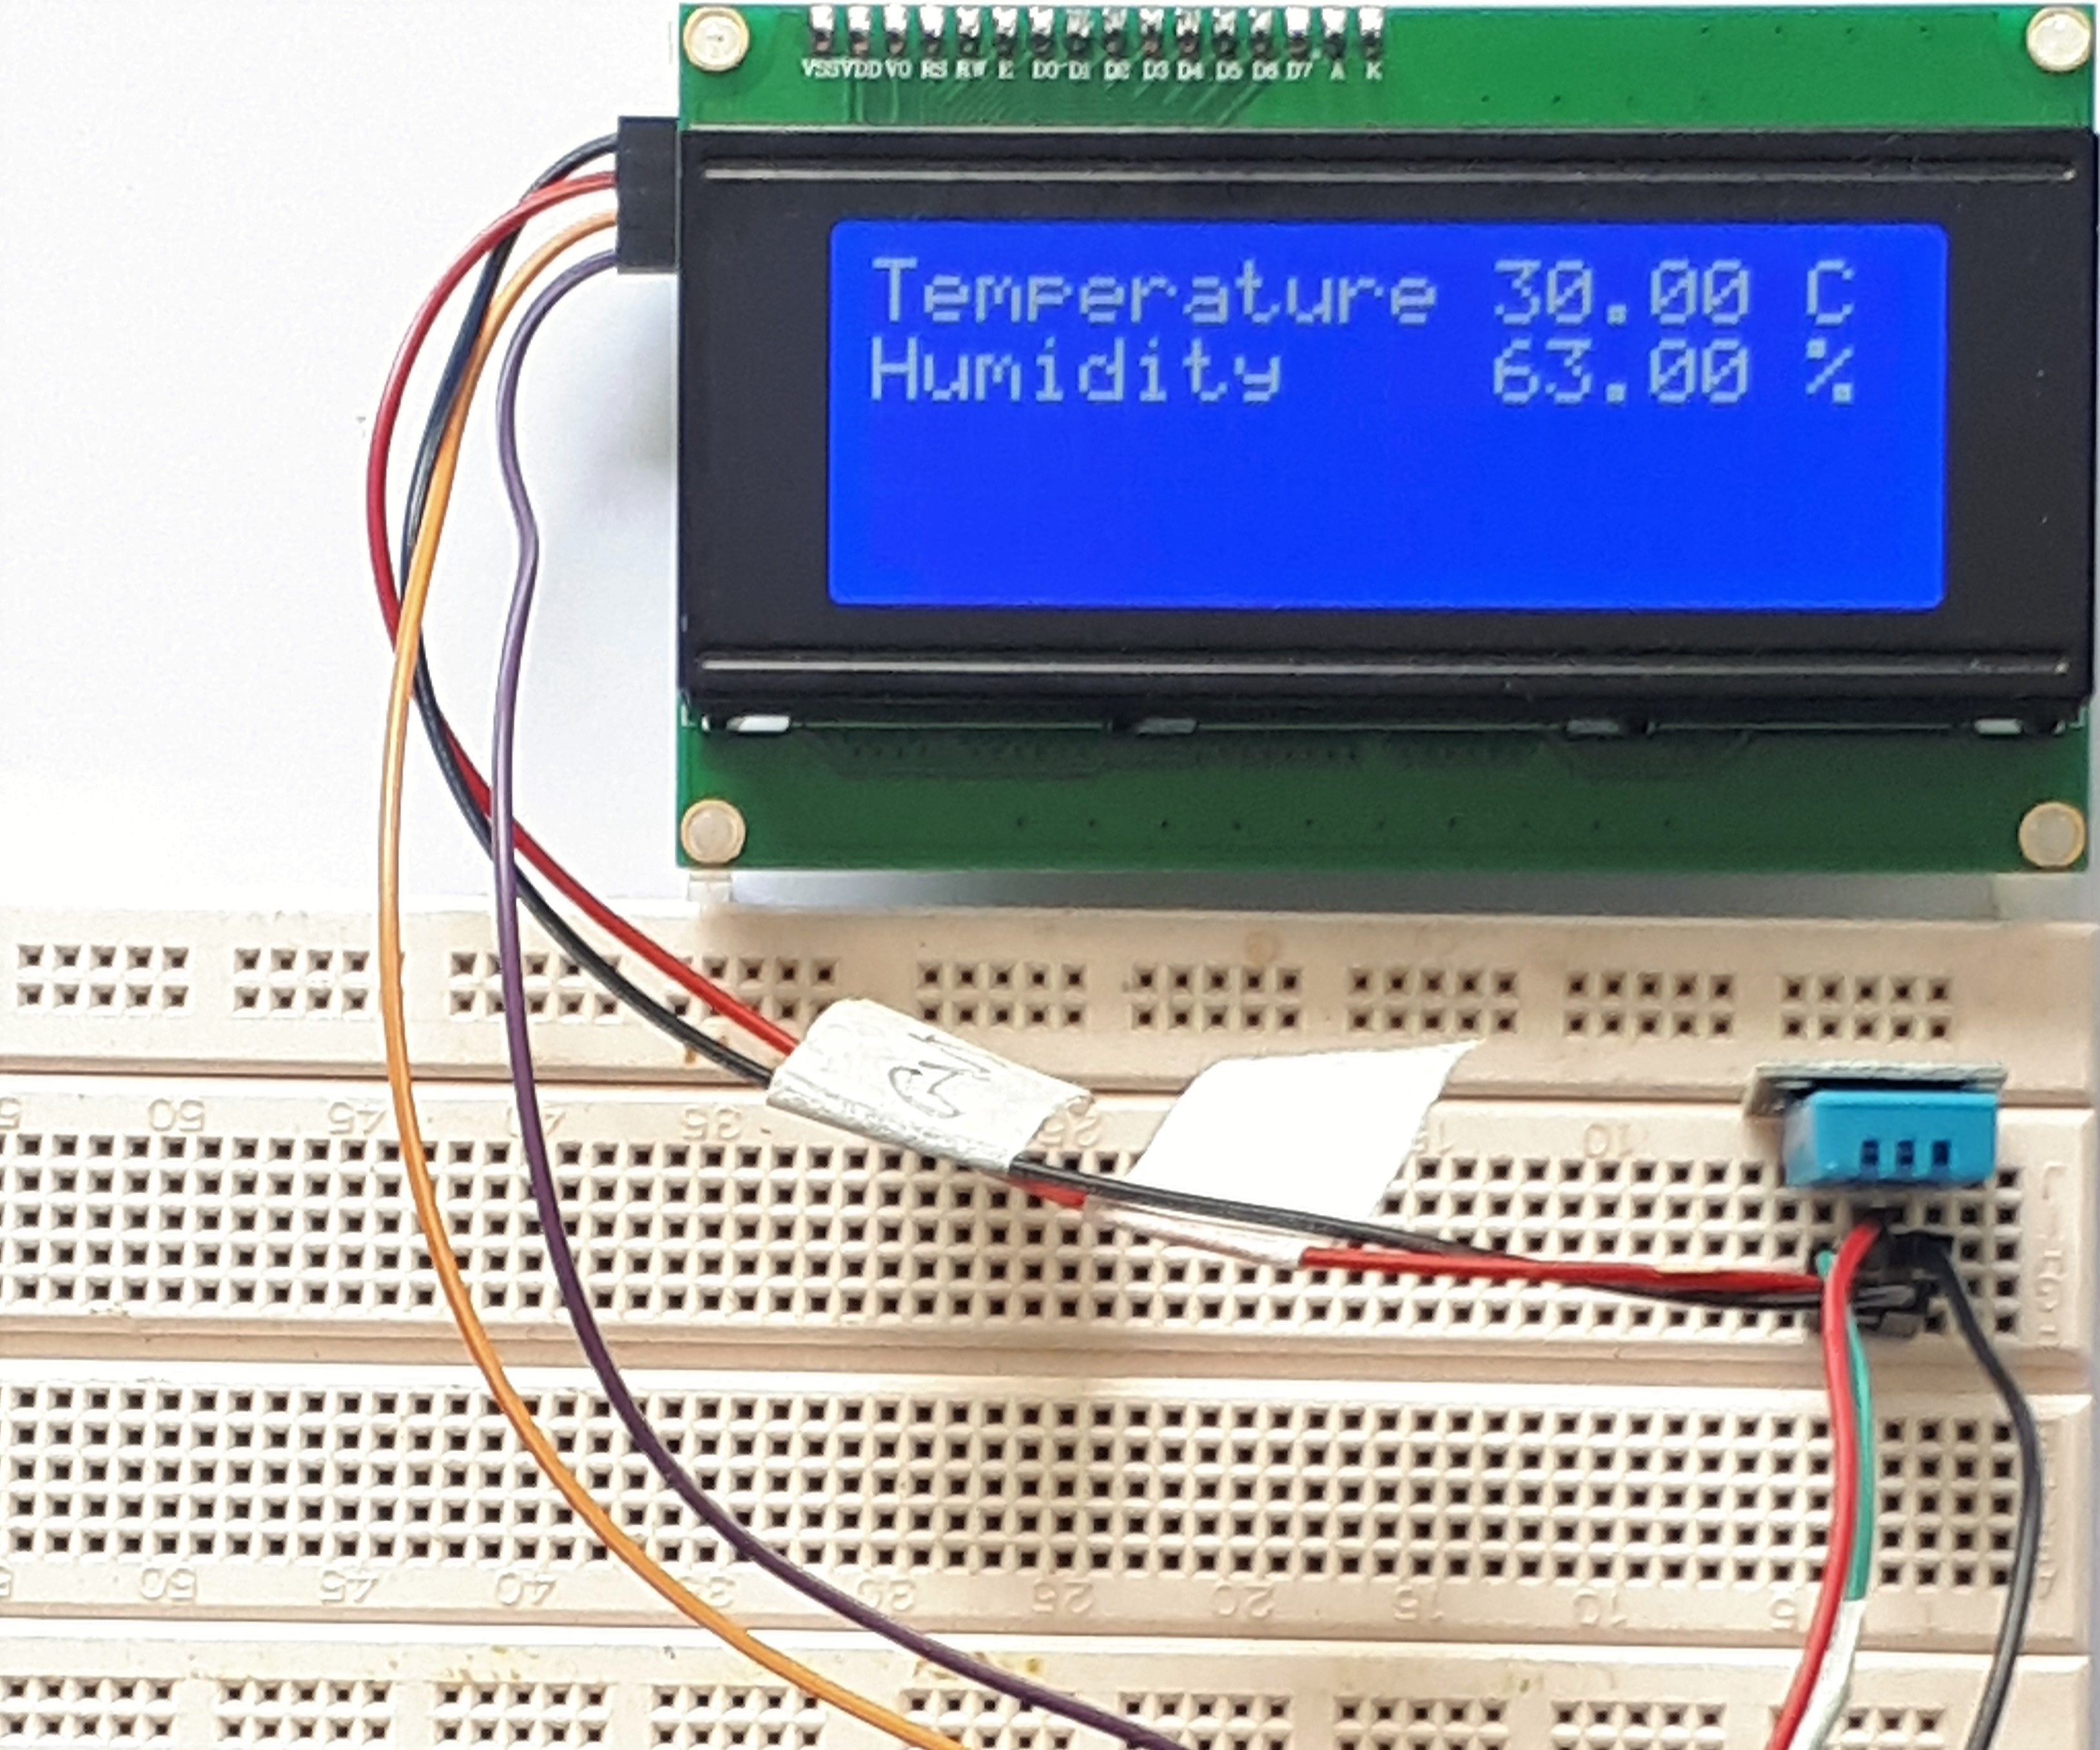 Sending Temperature & Humidity Data From Arduino to Raspberry Pi